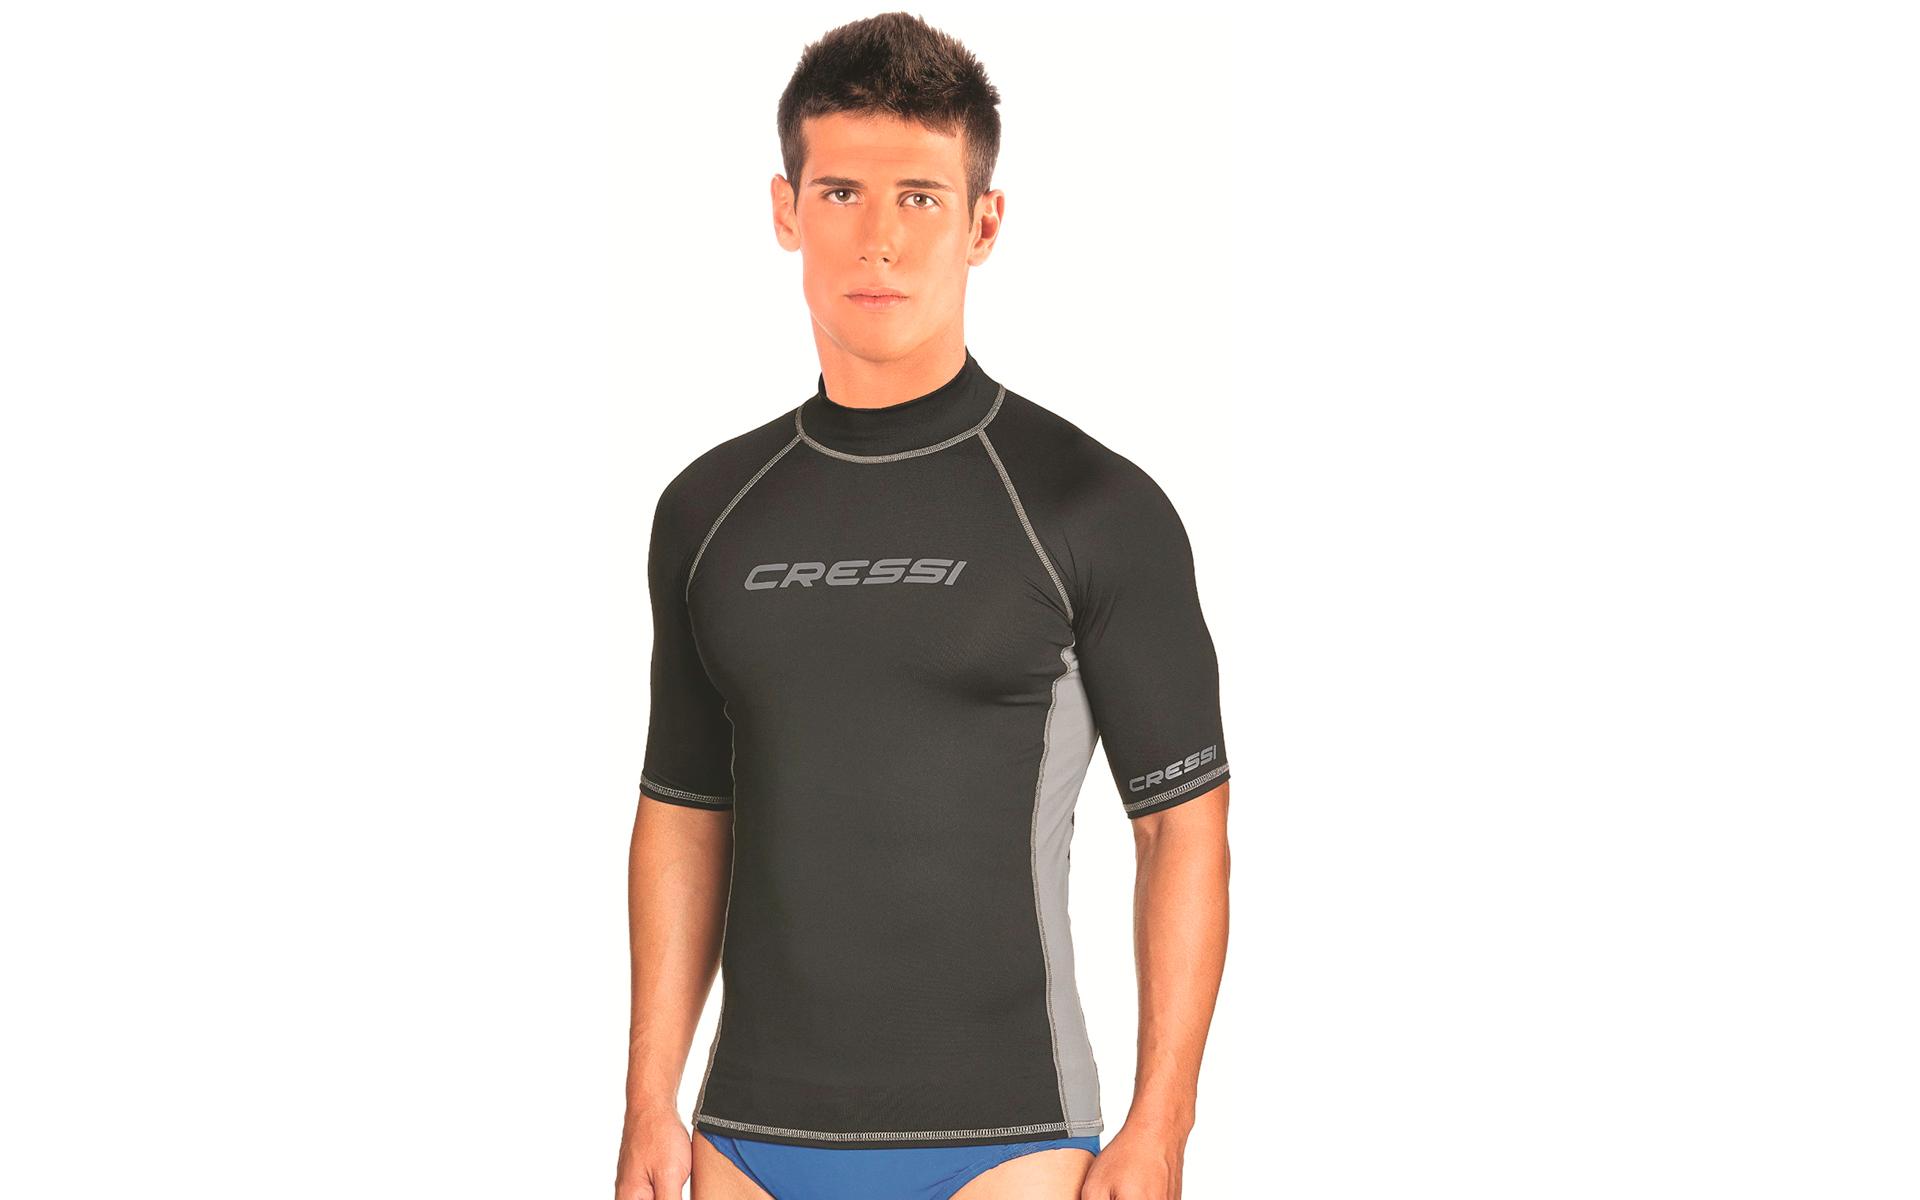 Cressi Wasser T-Shirt Herren Rash Guard schwarz - Preisvergleich